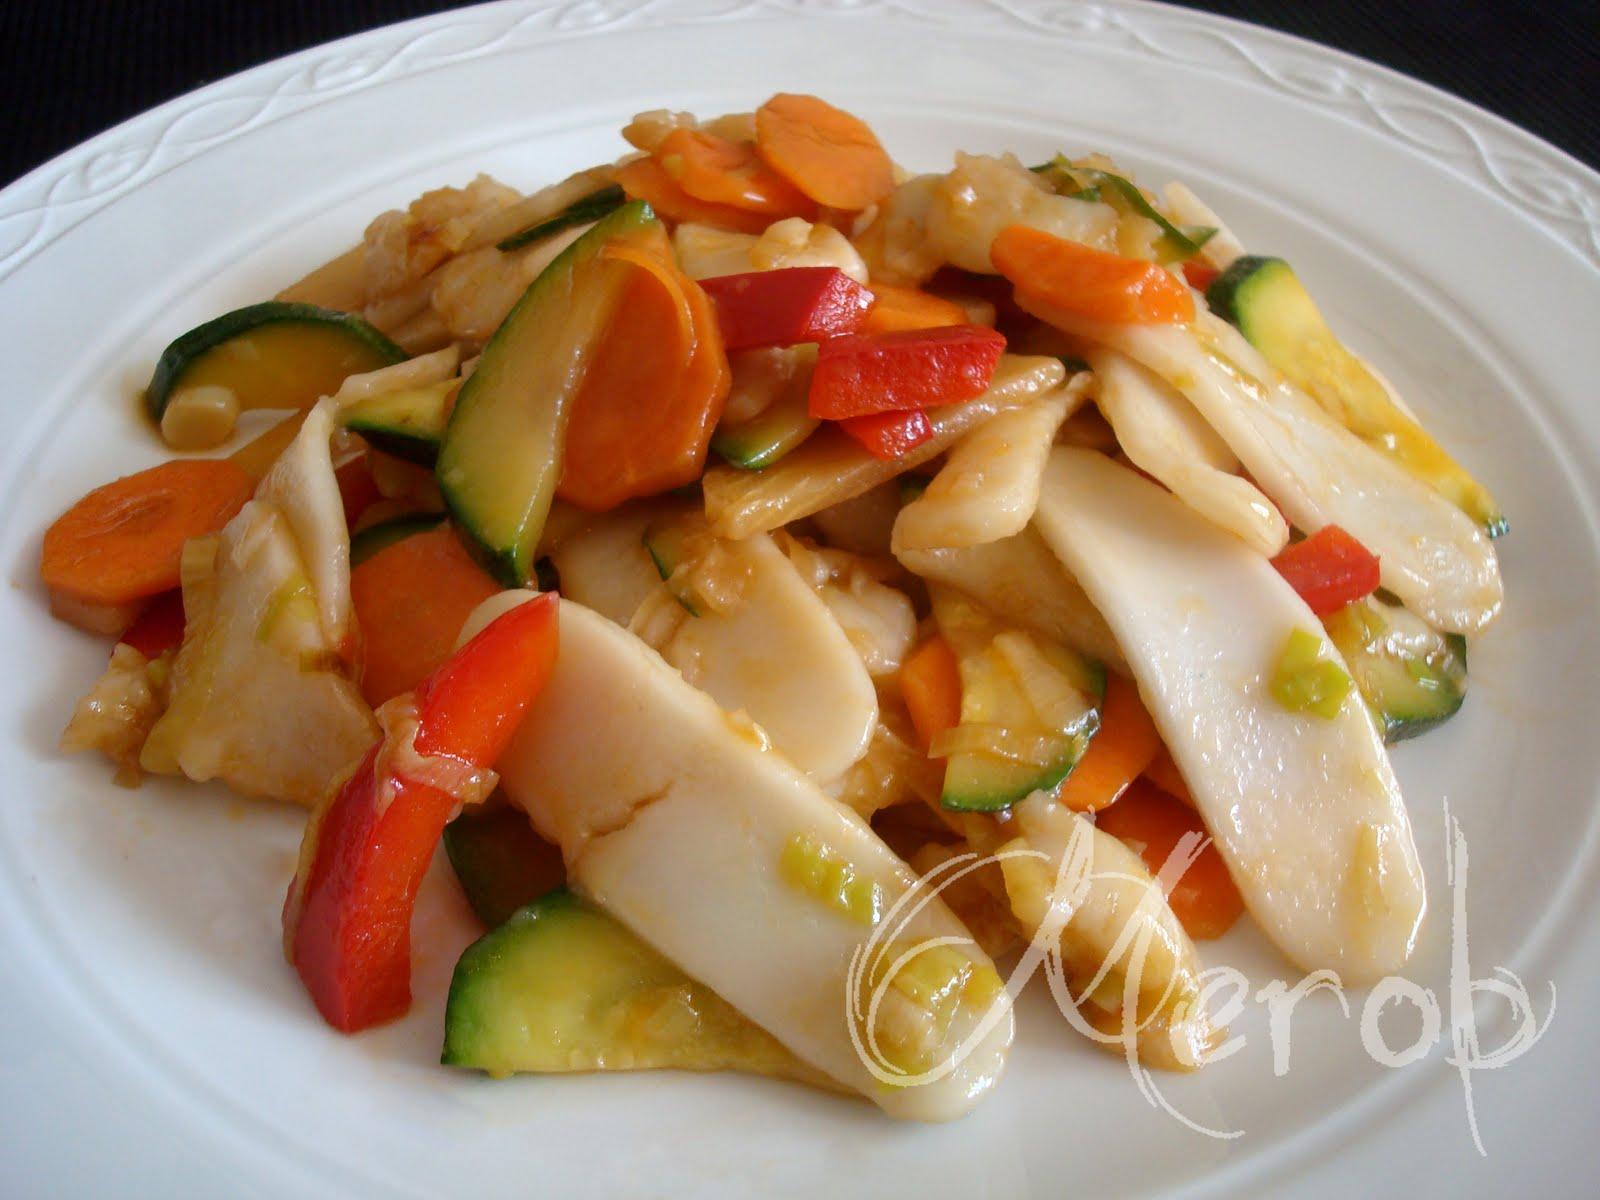 La cucina di merob gnocchi di riso saltati con verdure cina for Una salsa da cucina cinese